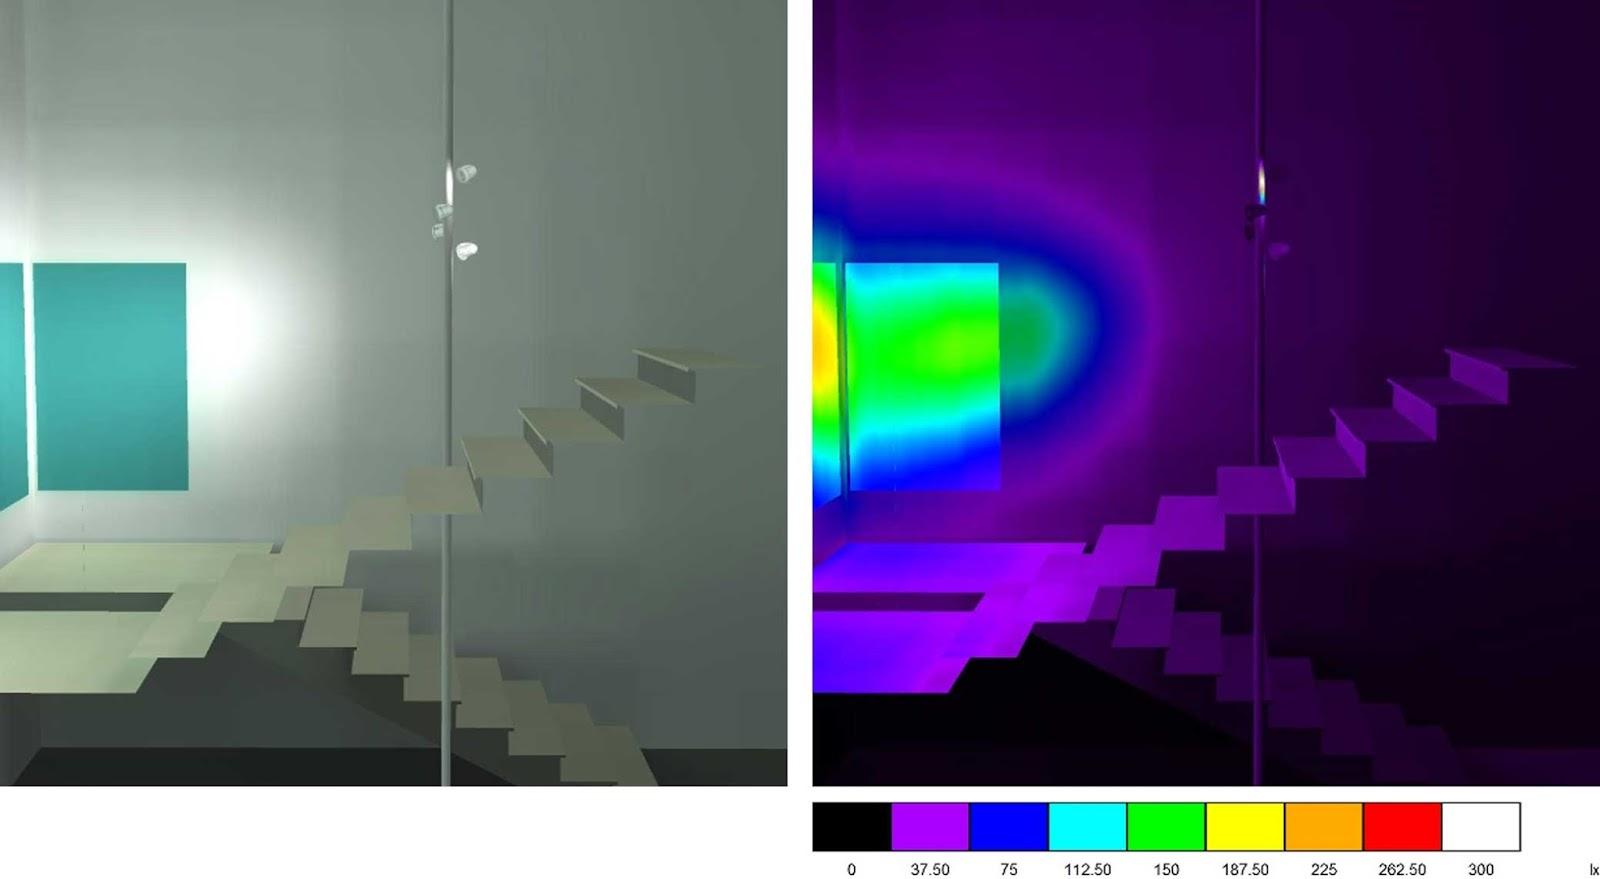 illuminazione led casa: lelide project illuminazione led presenta